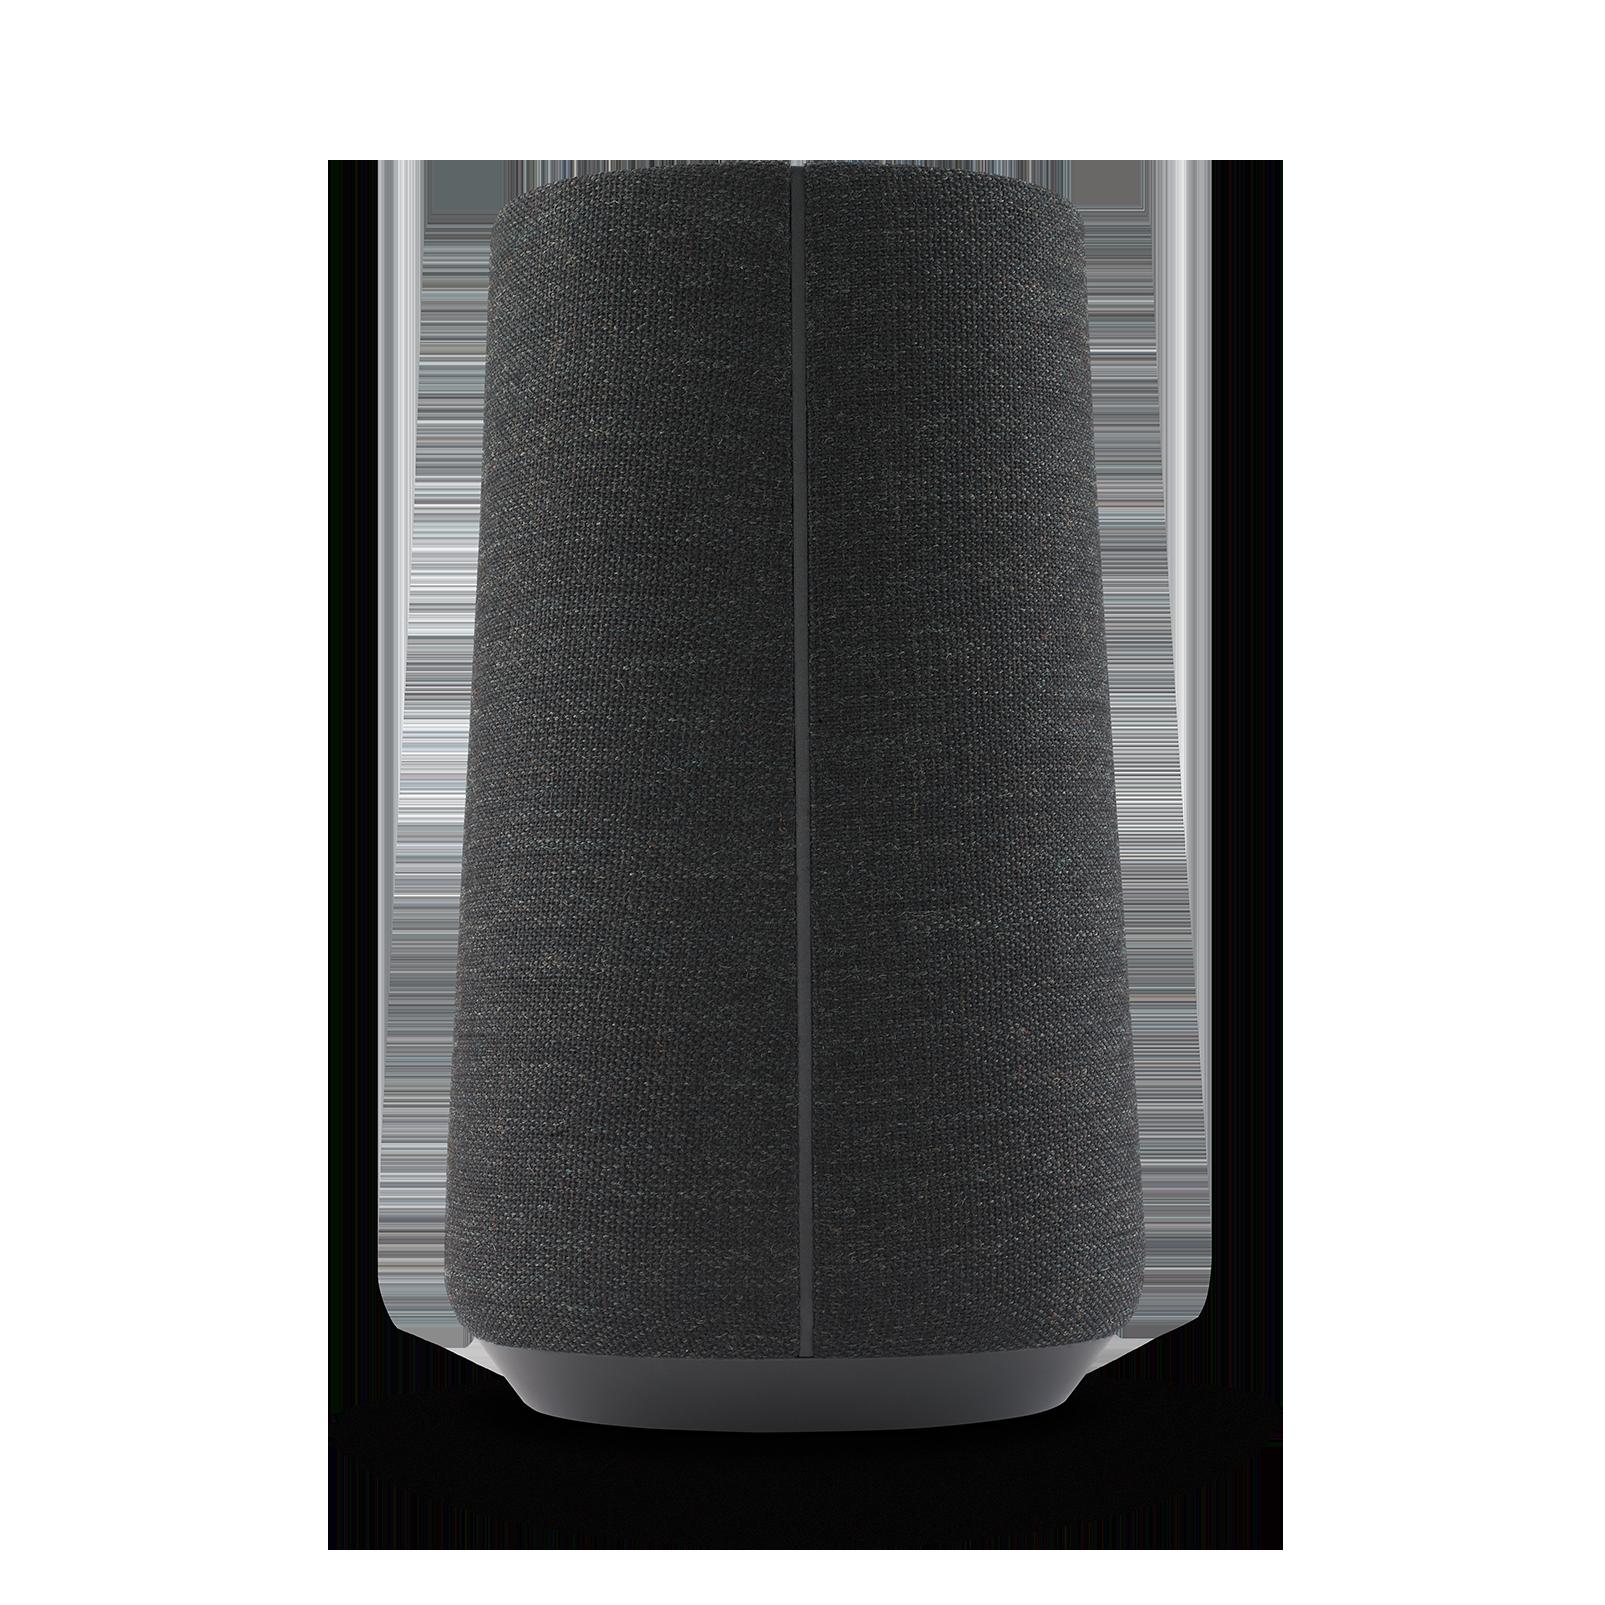 Harman Kardon Citation 100 - Black - The smallest, smartest home speaker with impactful sound - Detailshot 1